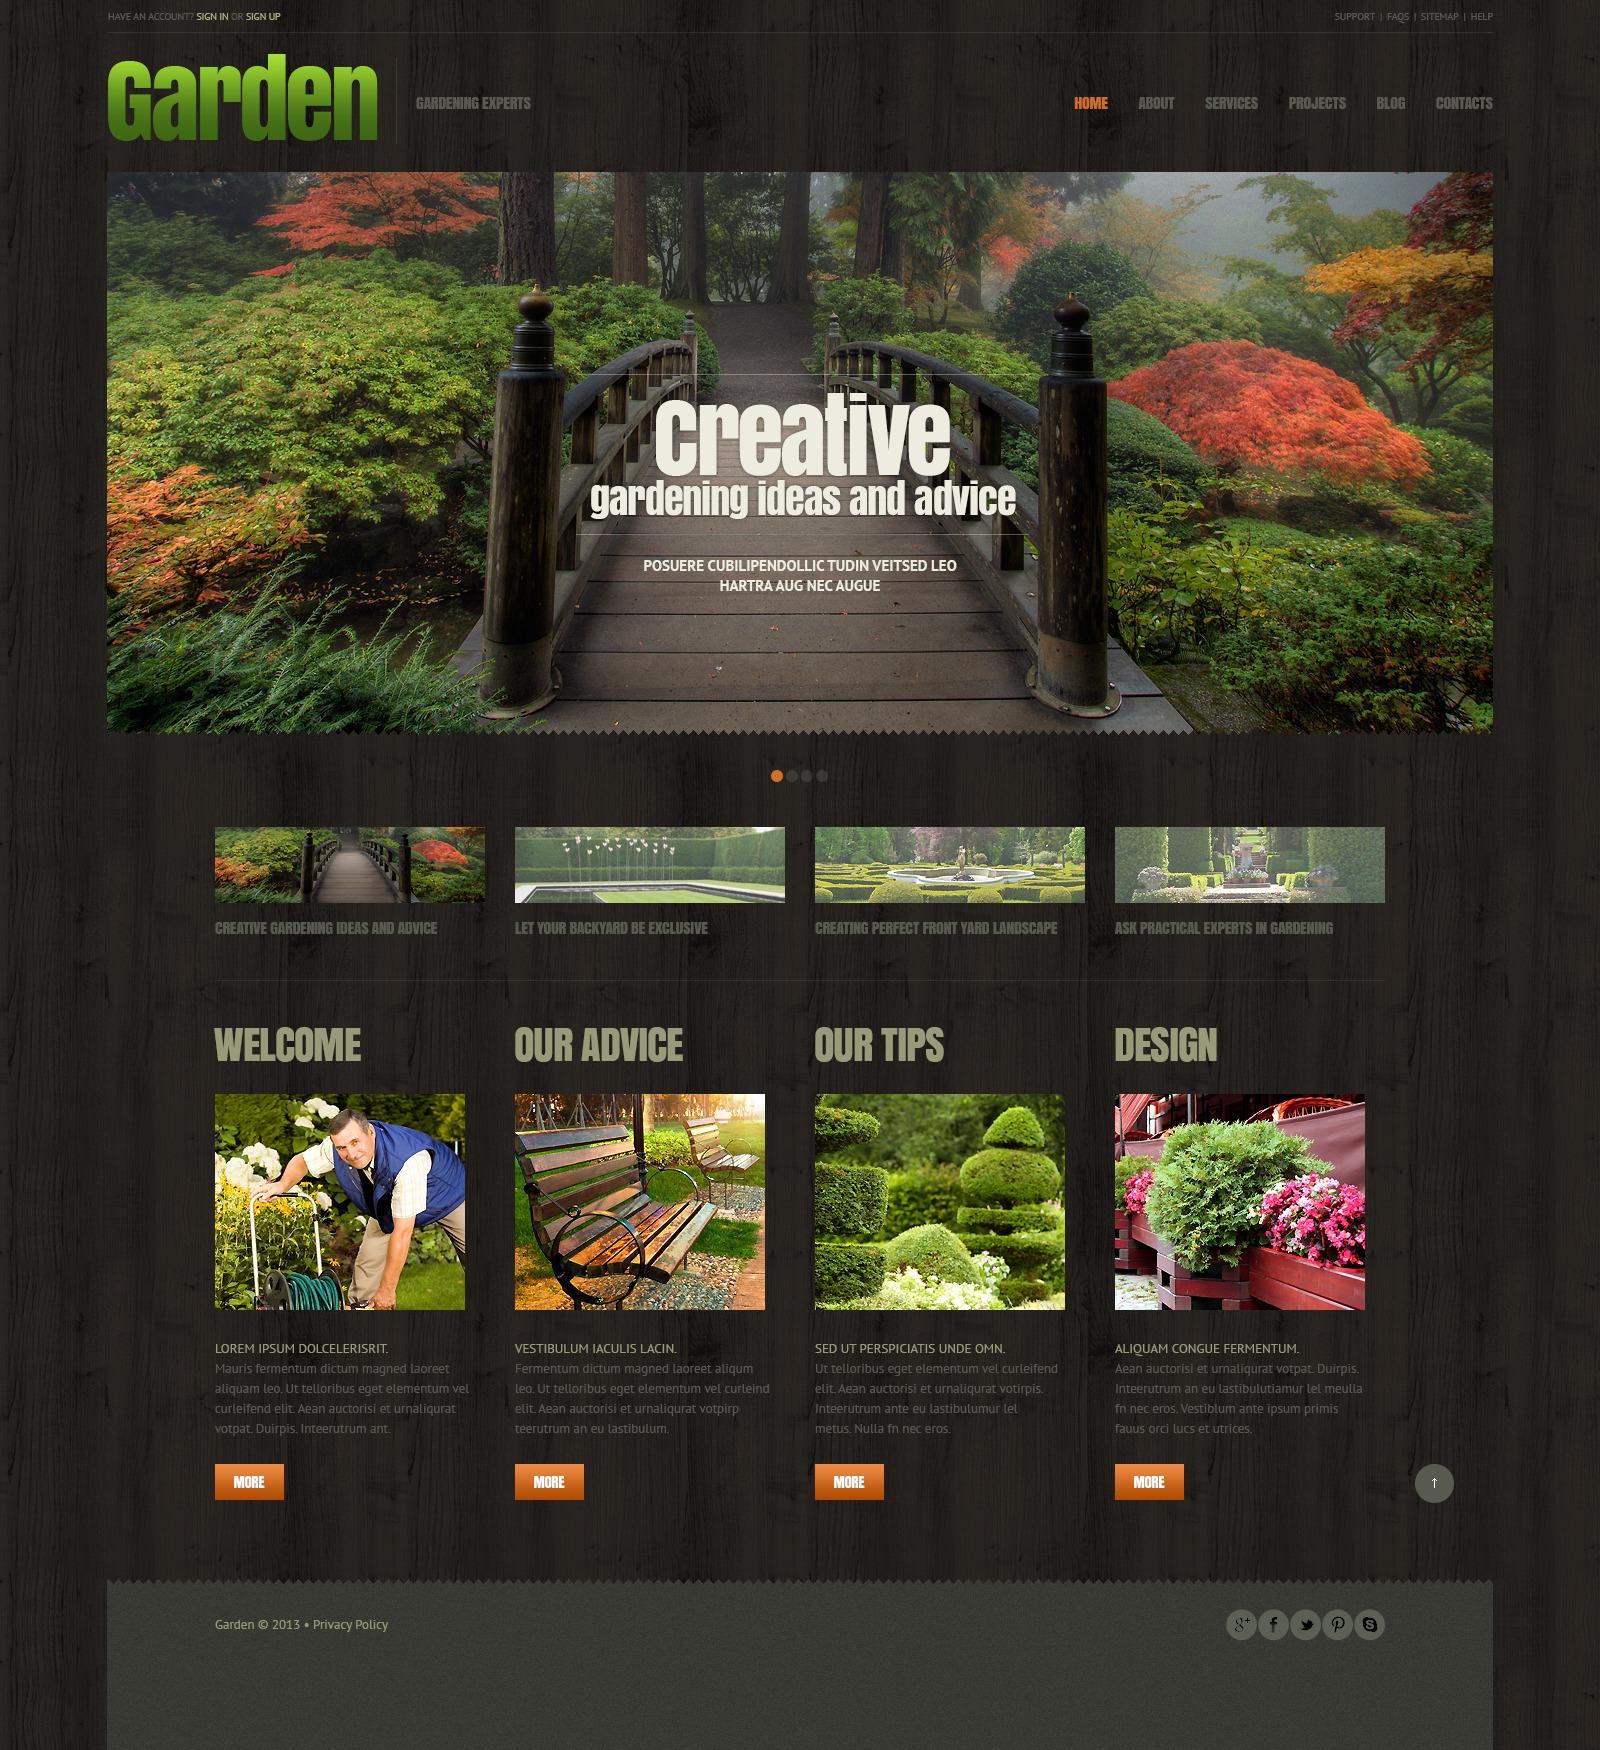 Thème WordPress adaptatif pour site de design de jardin #44898 - screenshot